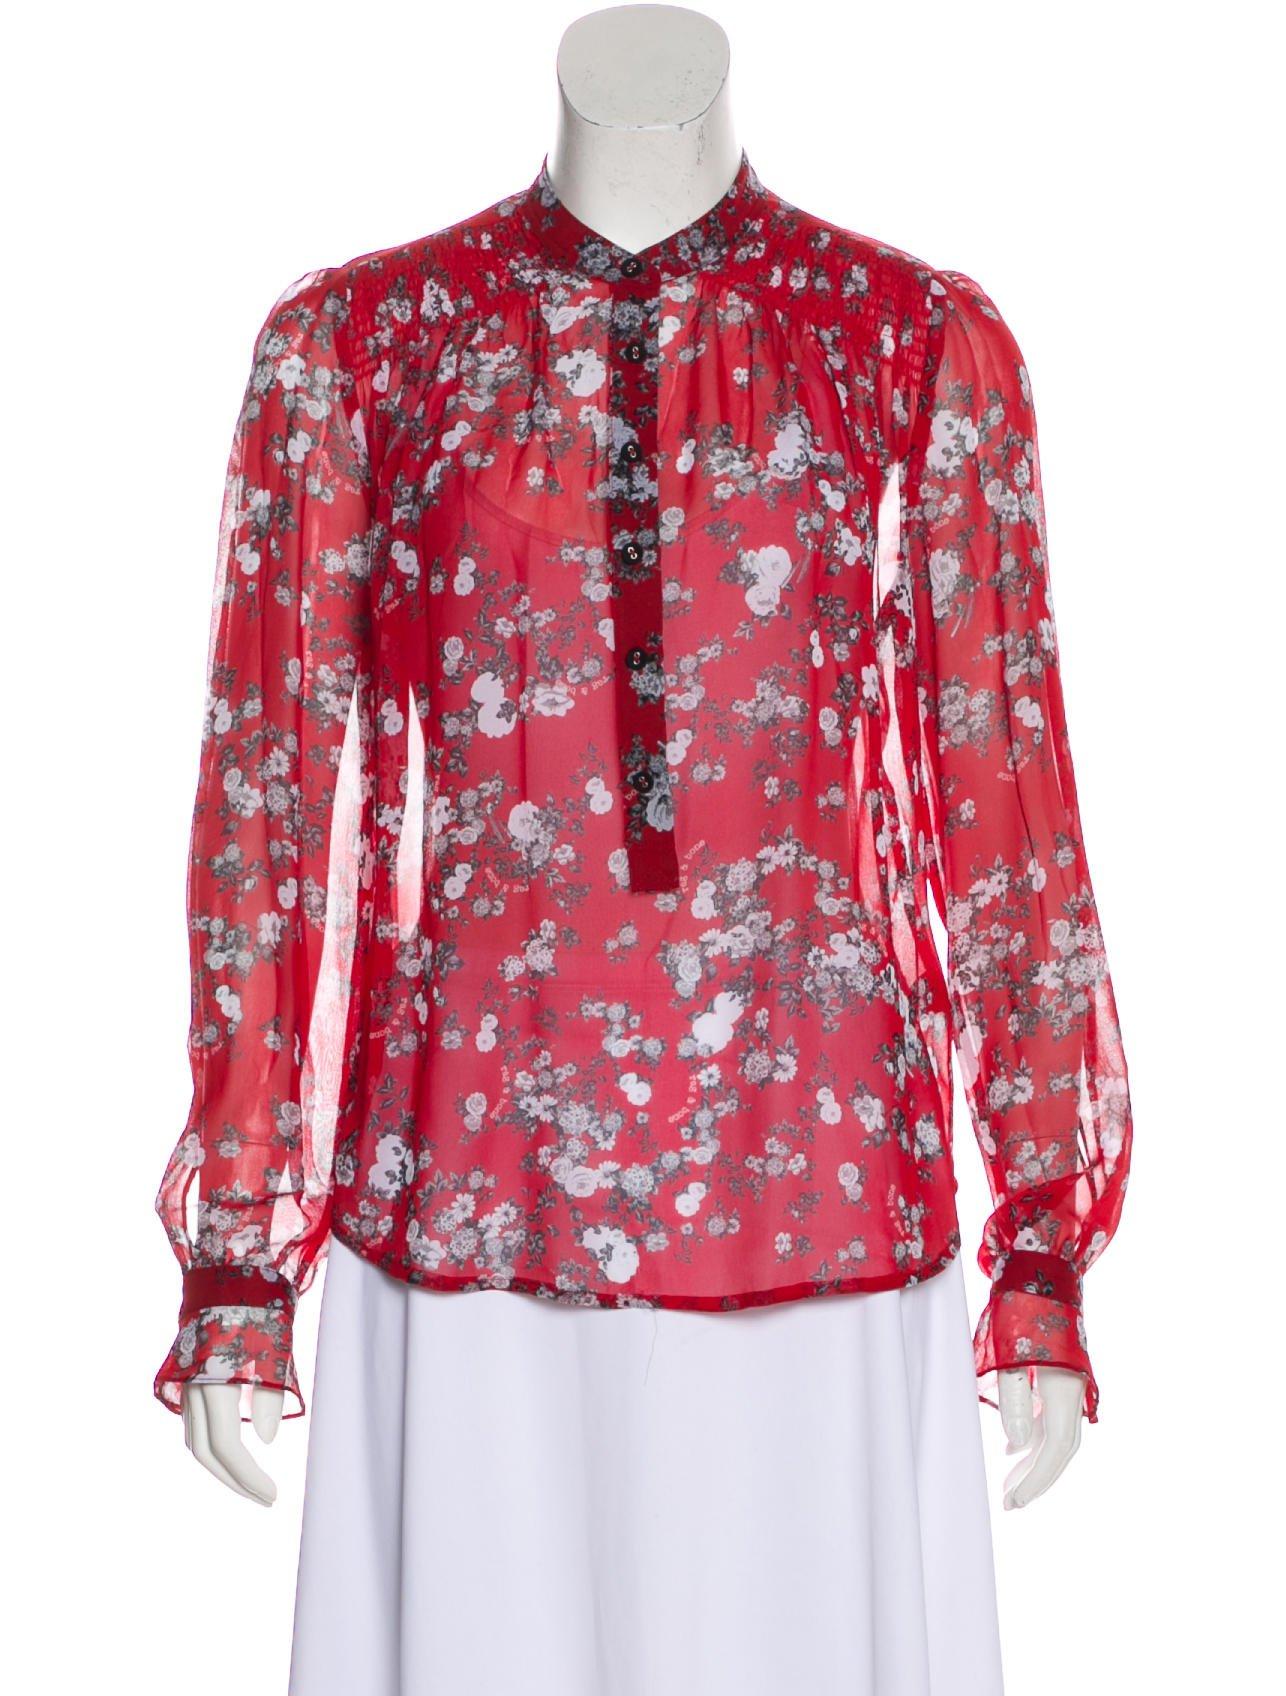 9a99c316de04f9 Rag & Bone Susan Button-Up Blouse - Clothing - WRAGB124317 | The ...